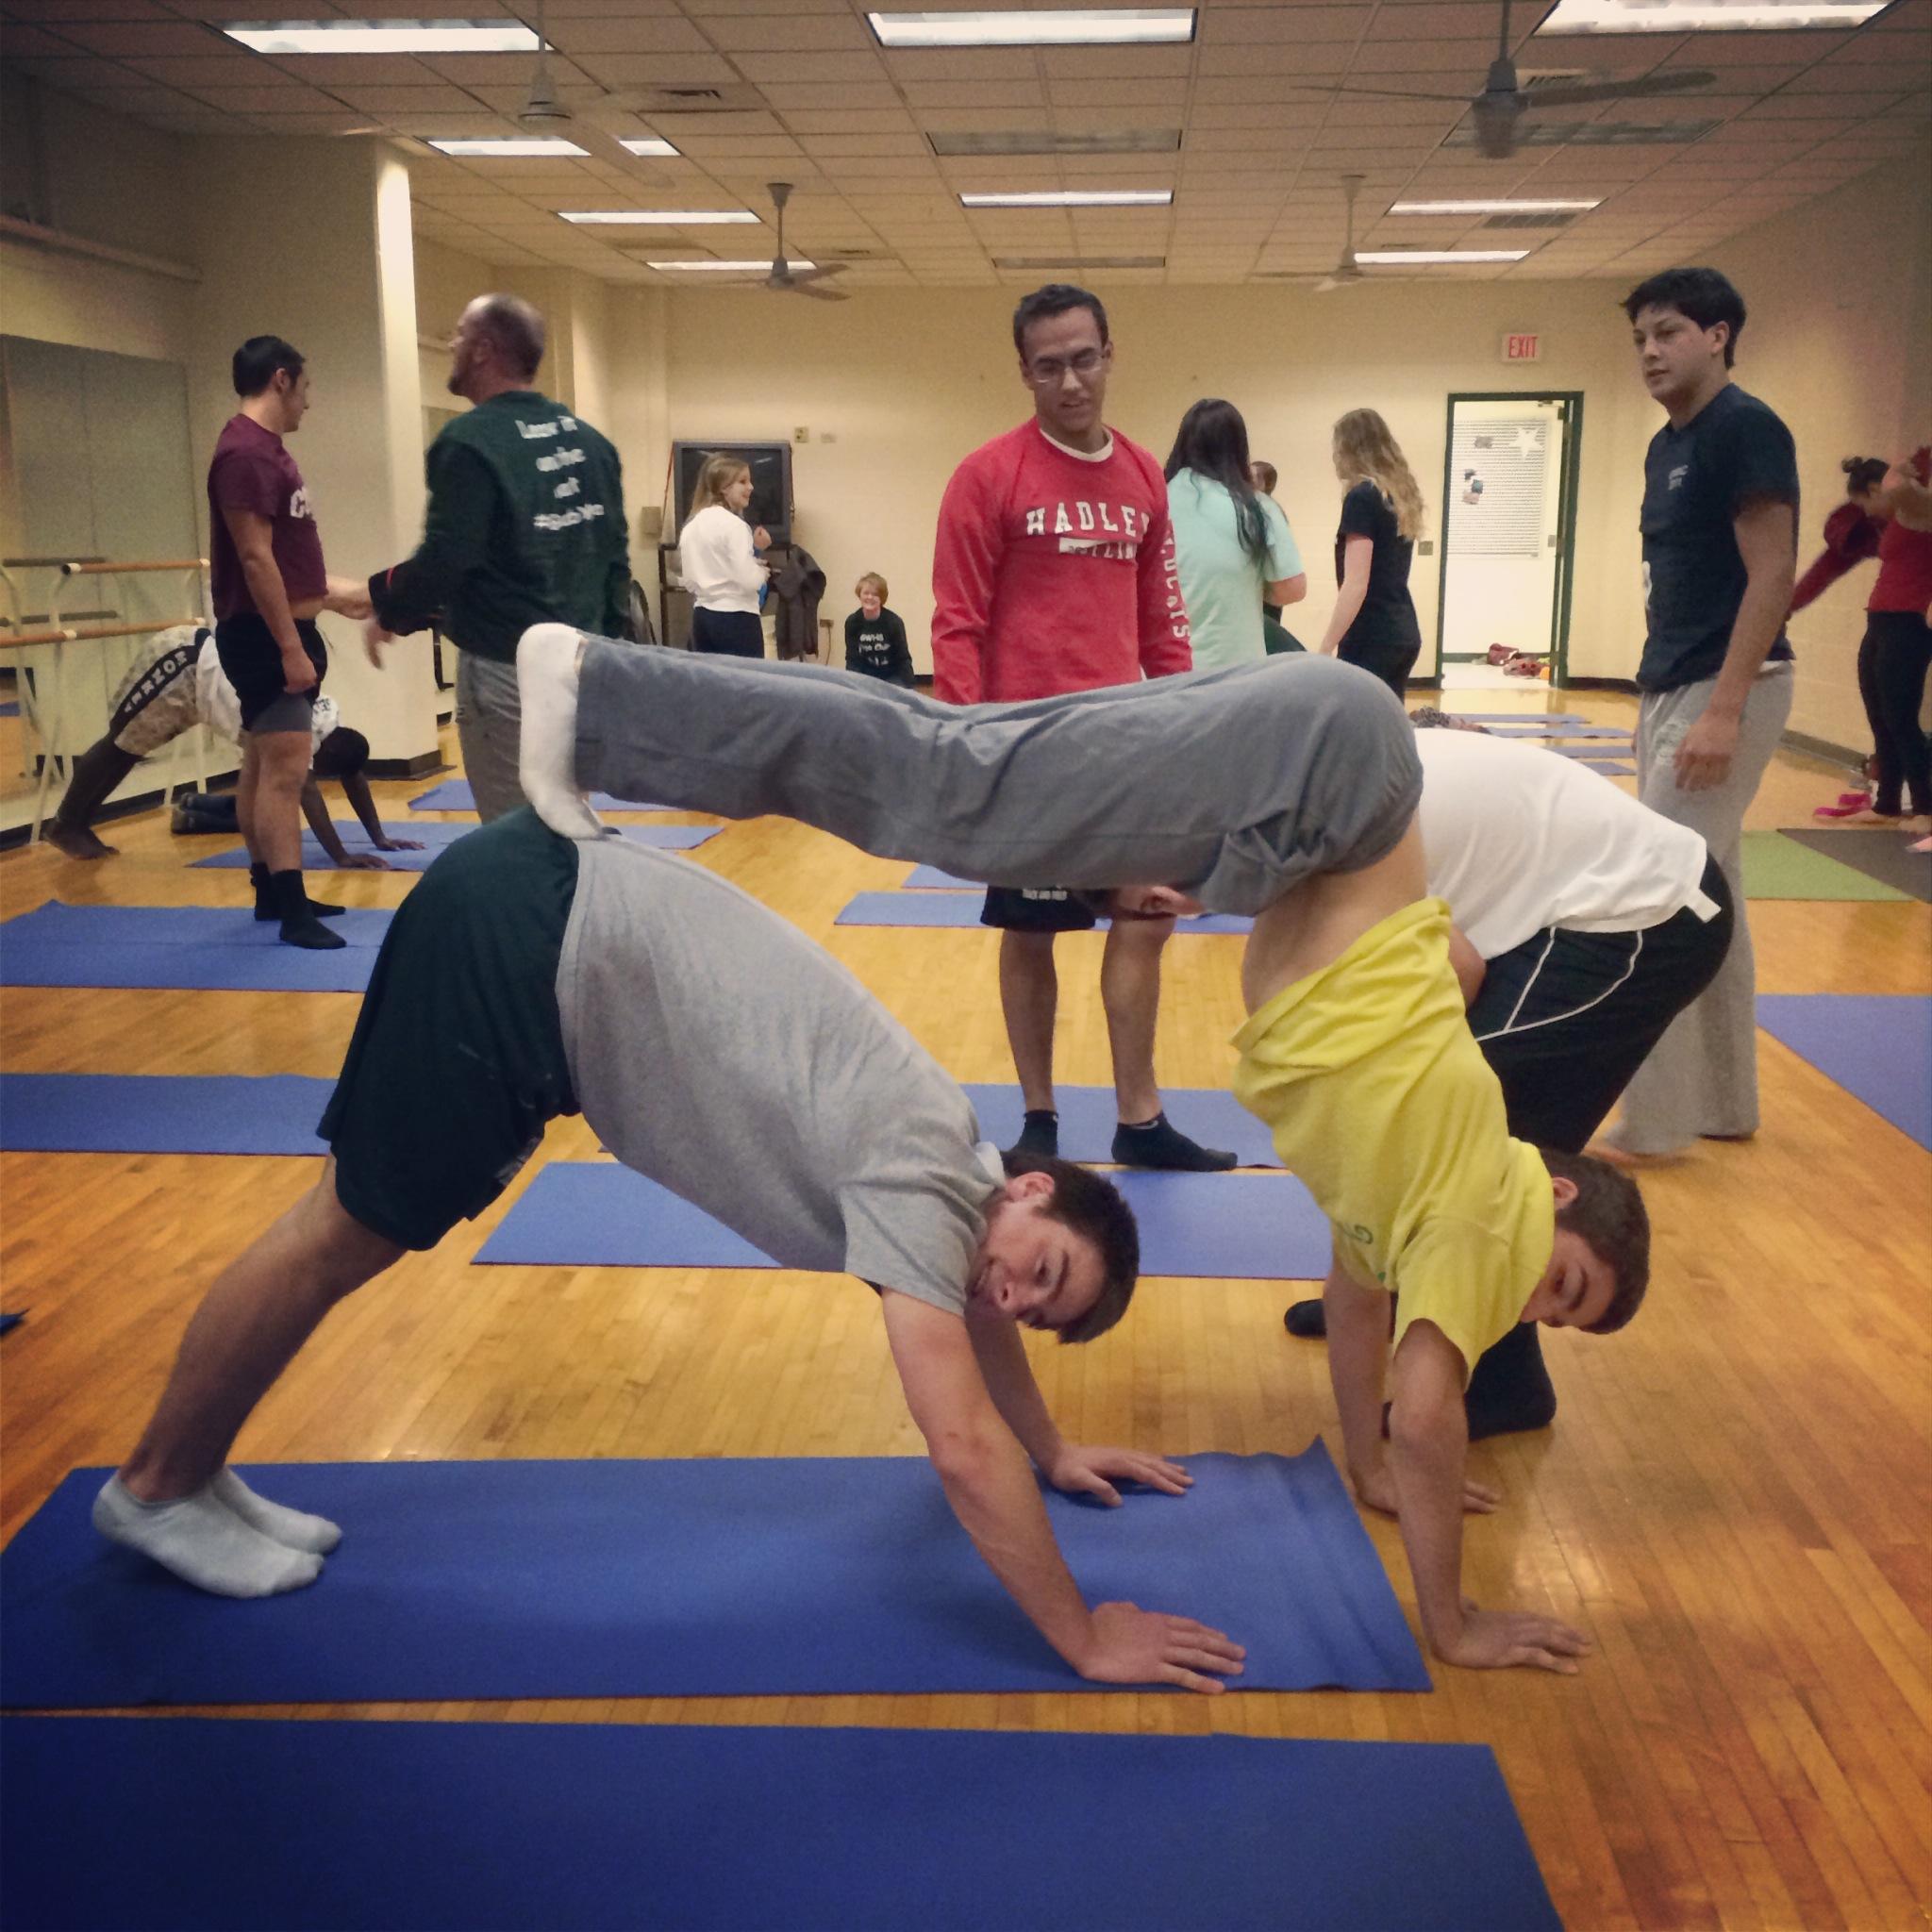 gdub yoga club 3.JPG